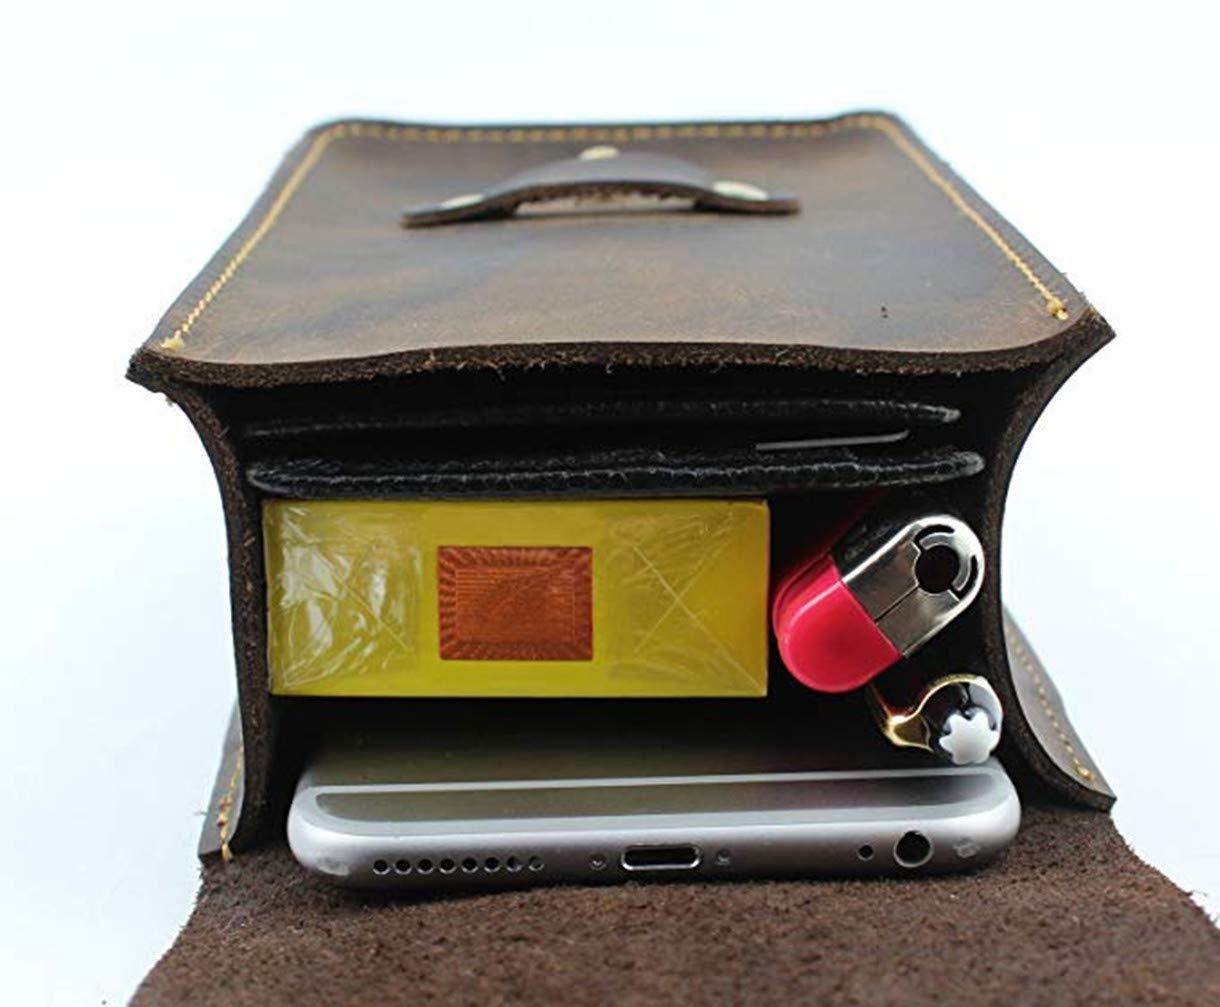 dream/_light Mens Genuine Leather Fanny Pack Waist Bag Belt Phone Pouch Bum Bags for Men Vintage Travel Leisure Sport Waist Pack